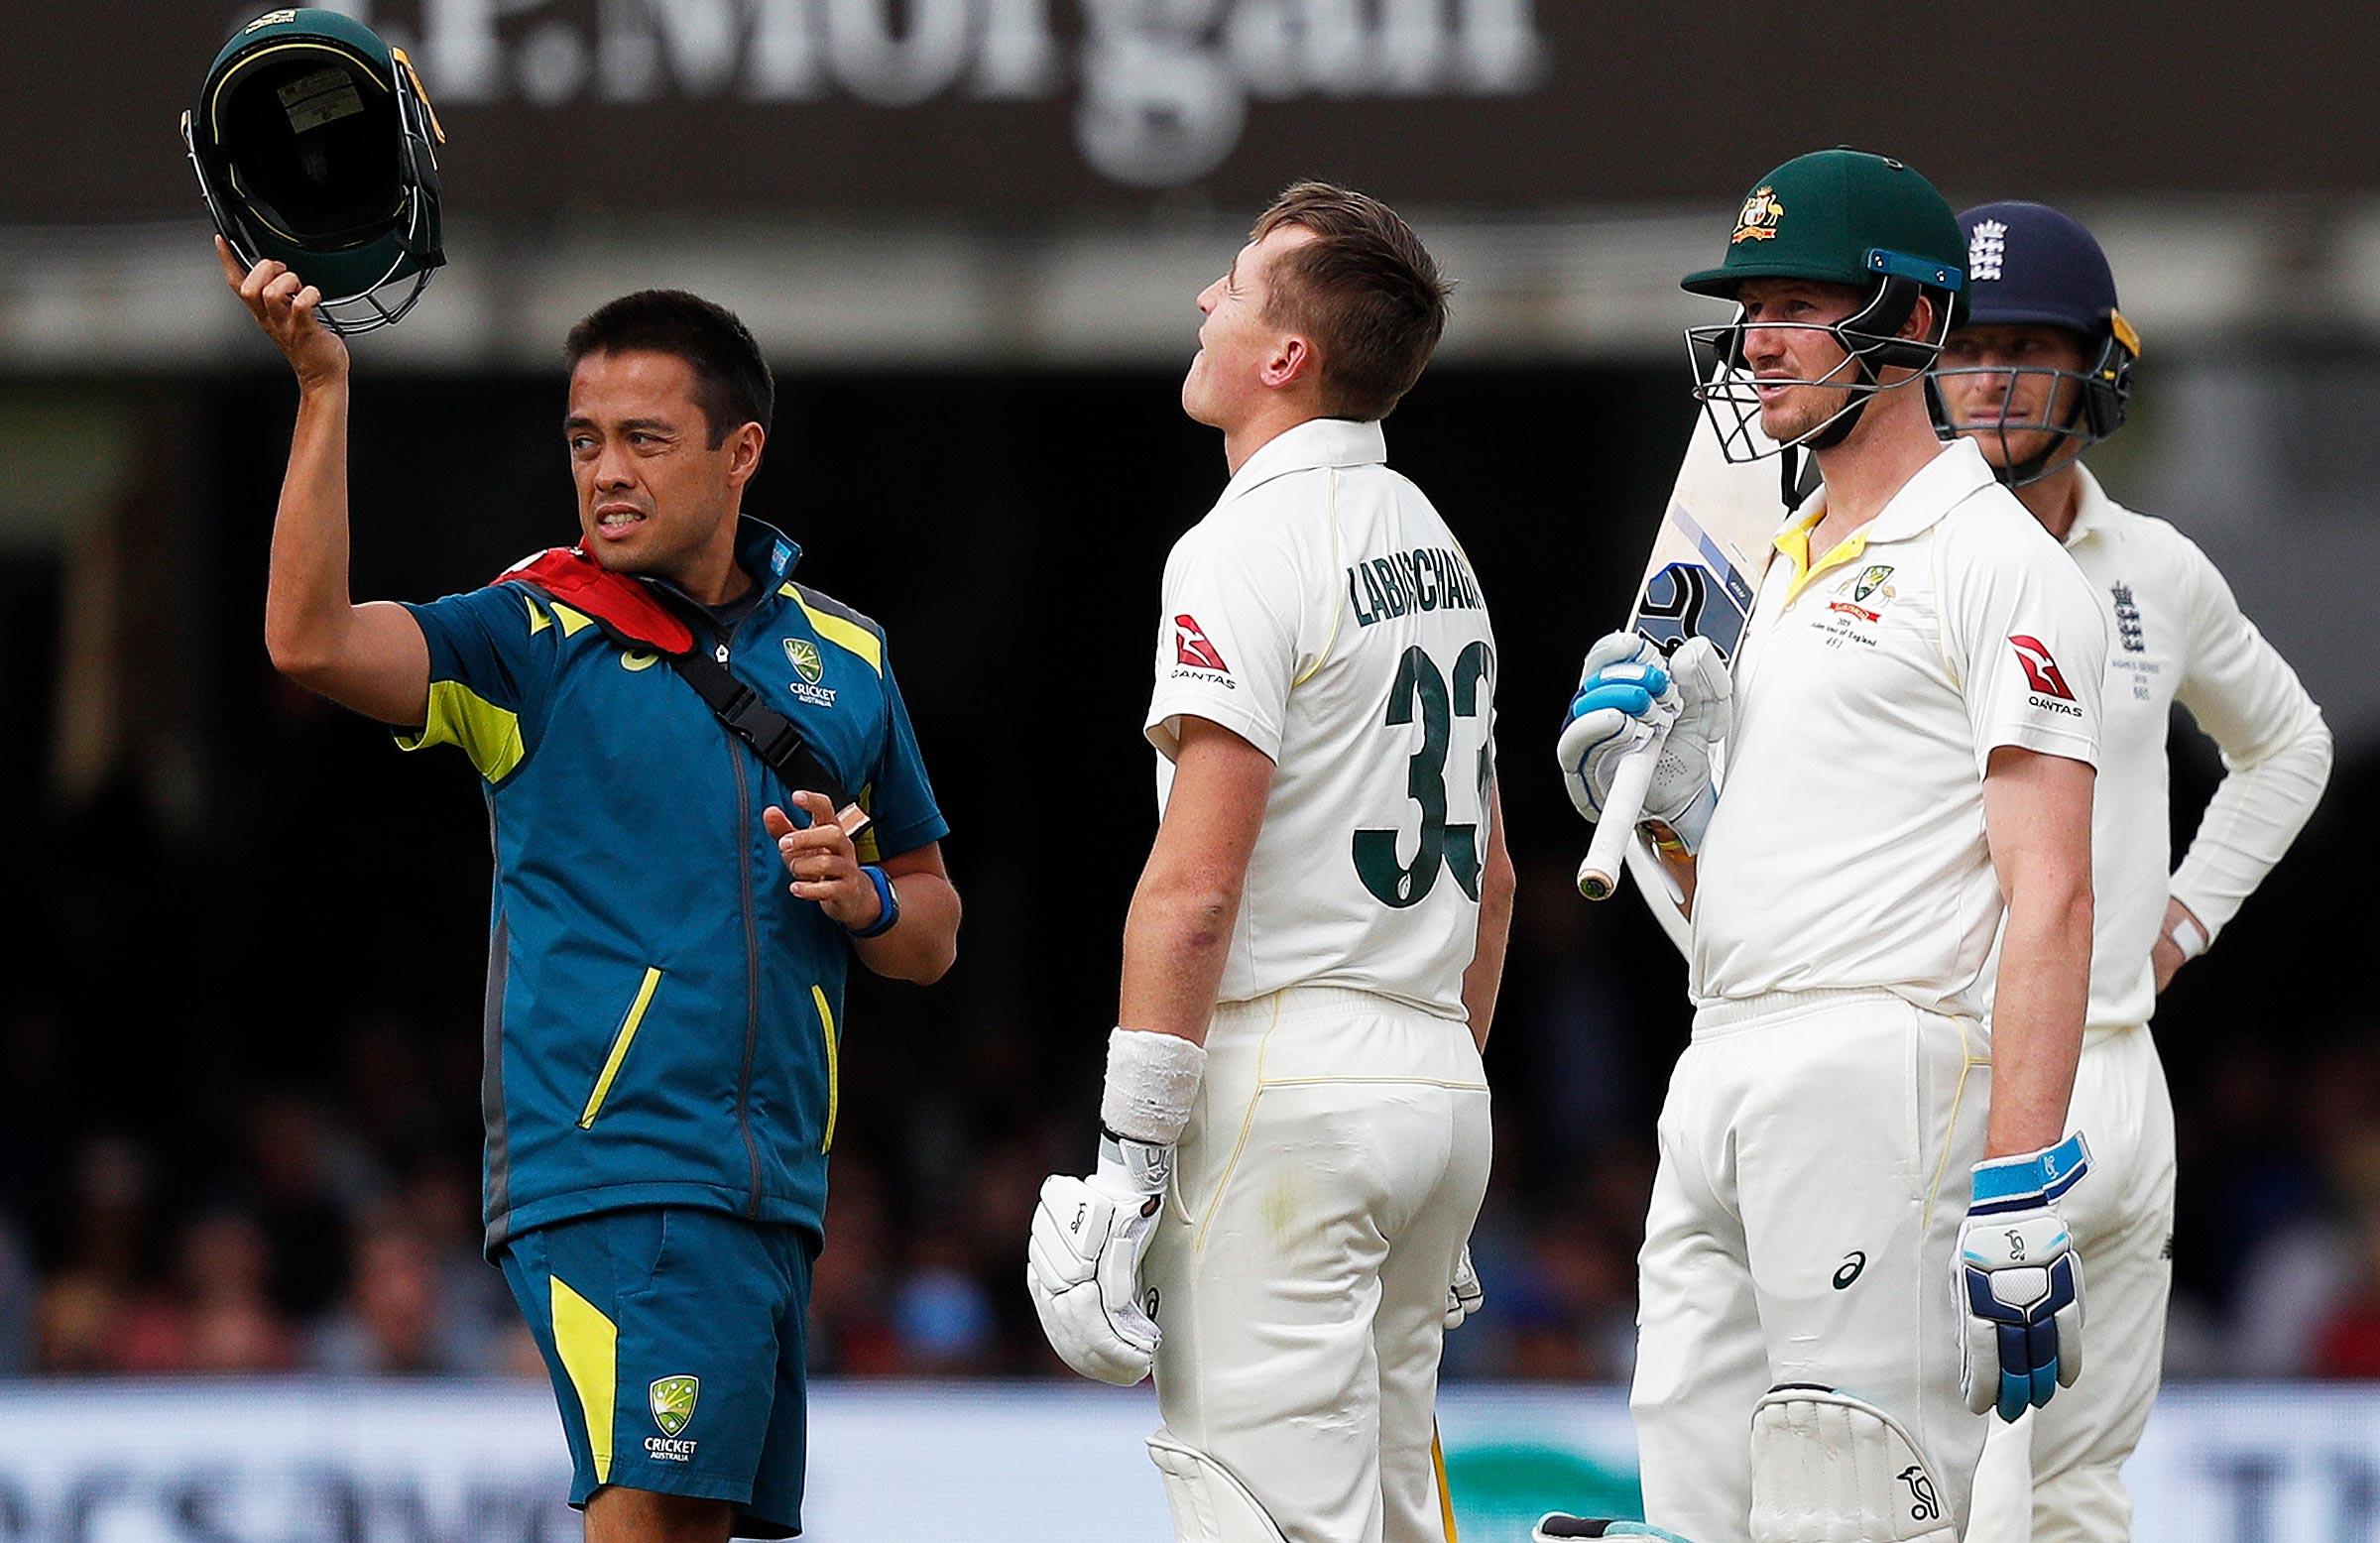 CA medical boss backs Aussie team doctor | cricket.com.au